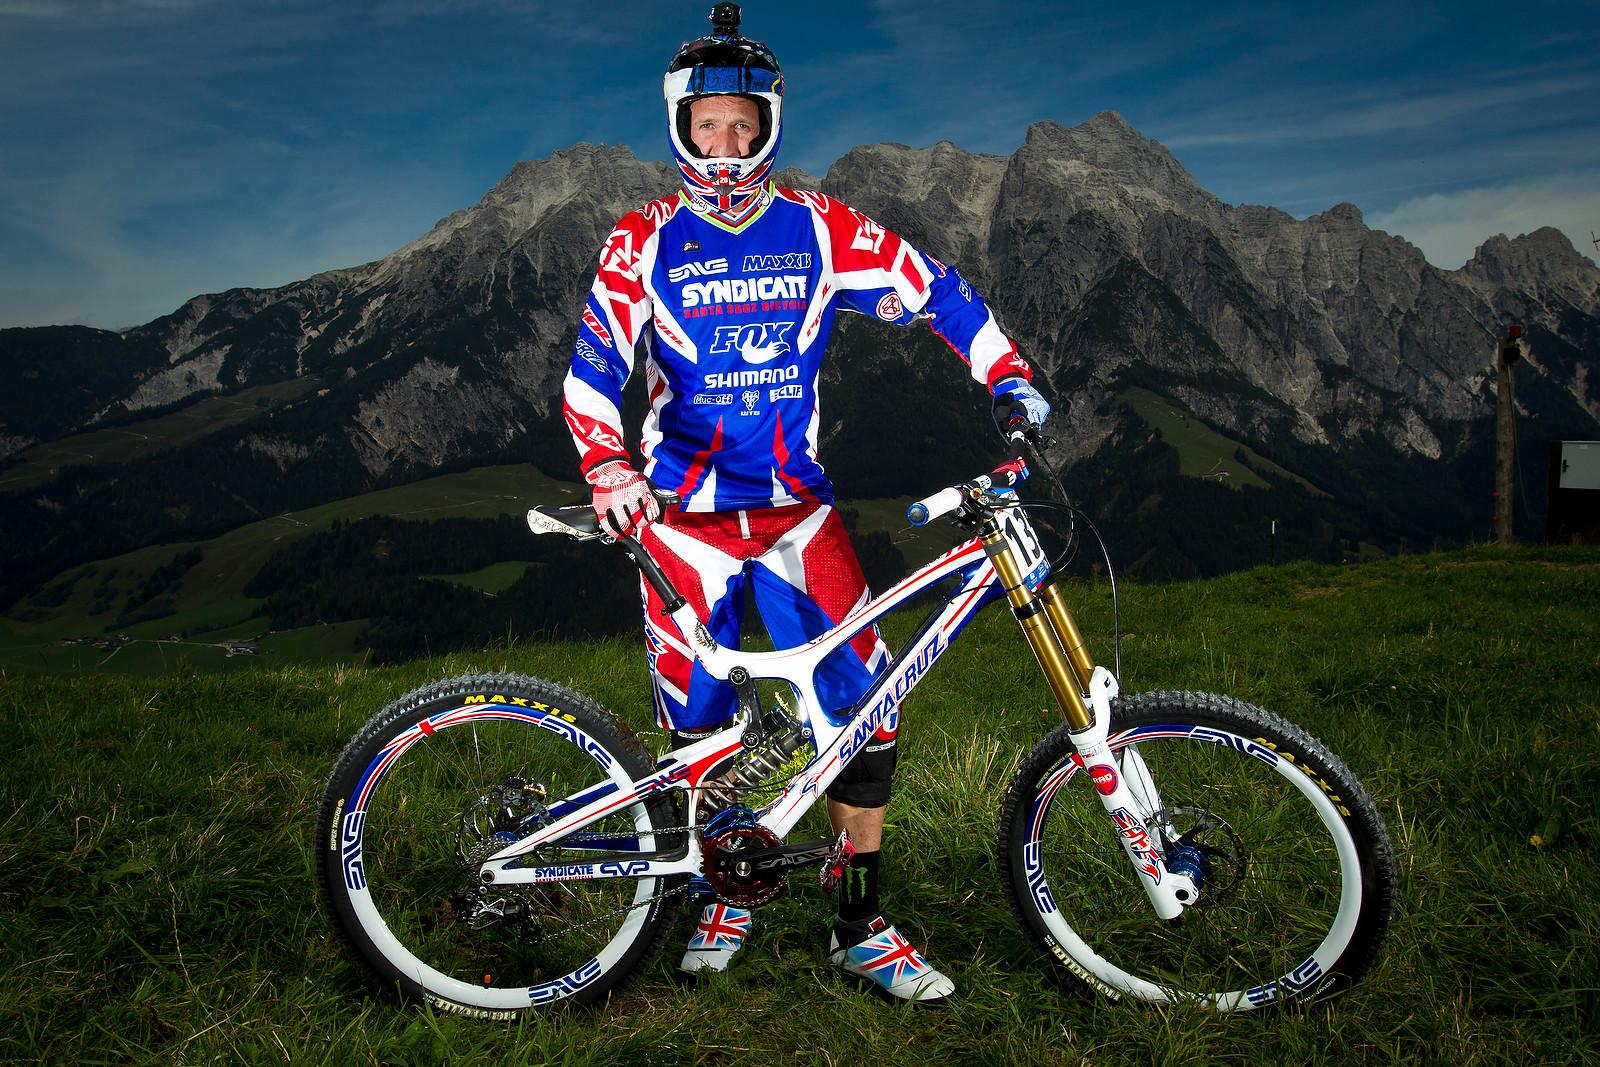 Steve Peat with his Custom Santa Cruz V10c - World Championships Riders and Bikes - Mountain Biking Pictures - Vital MTB